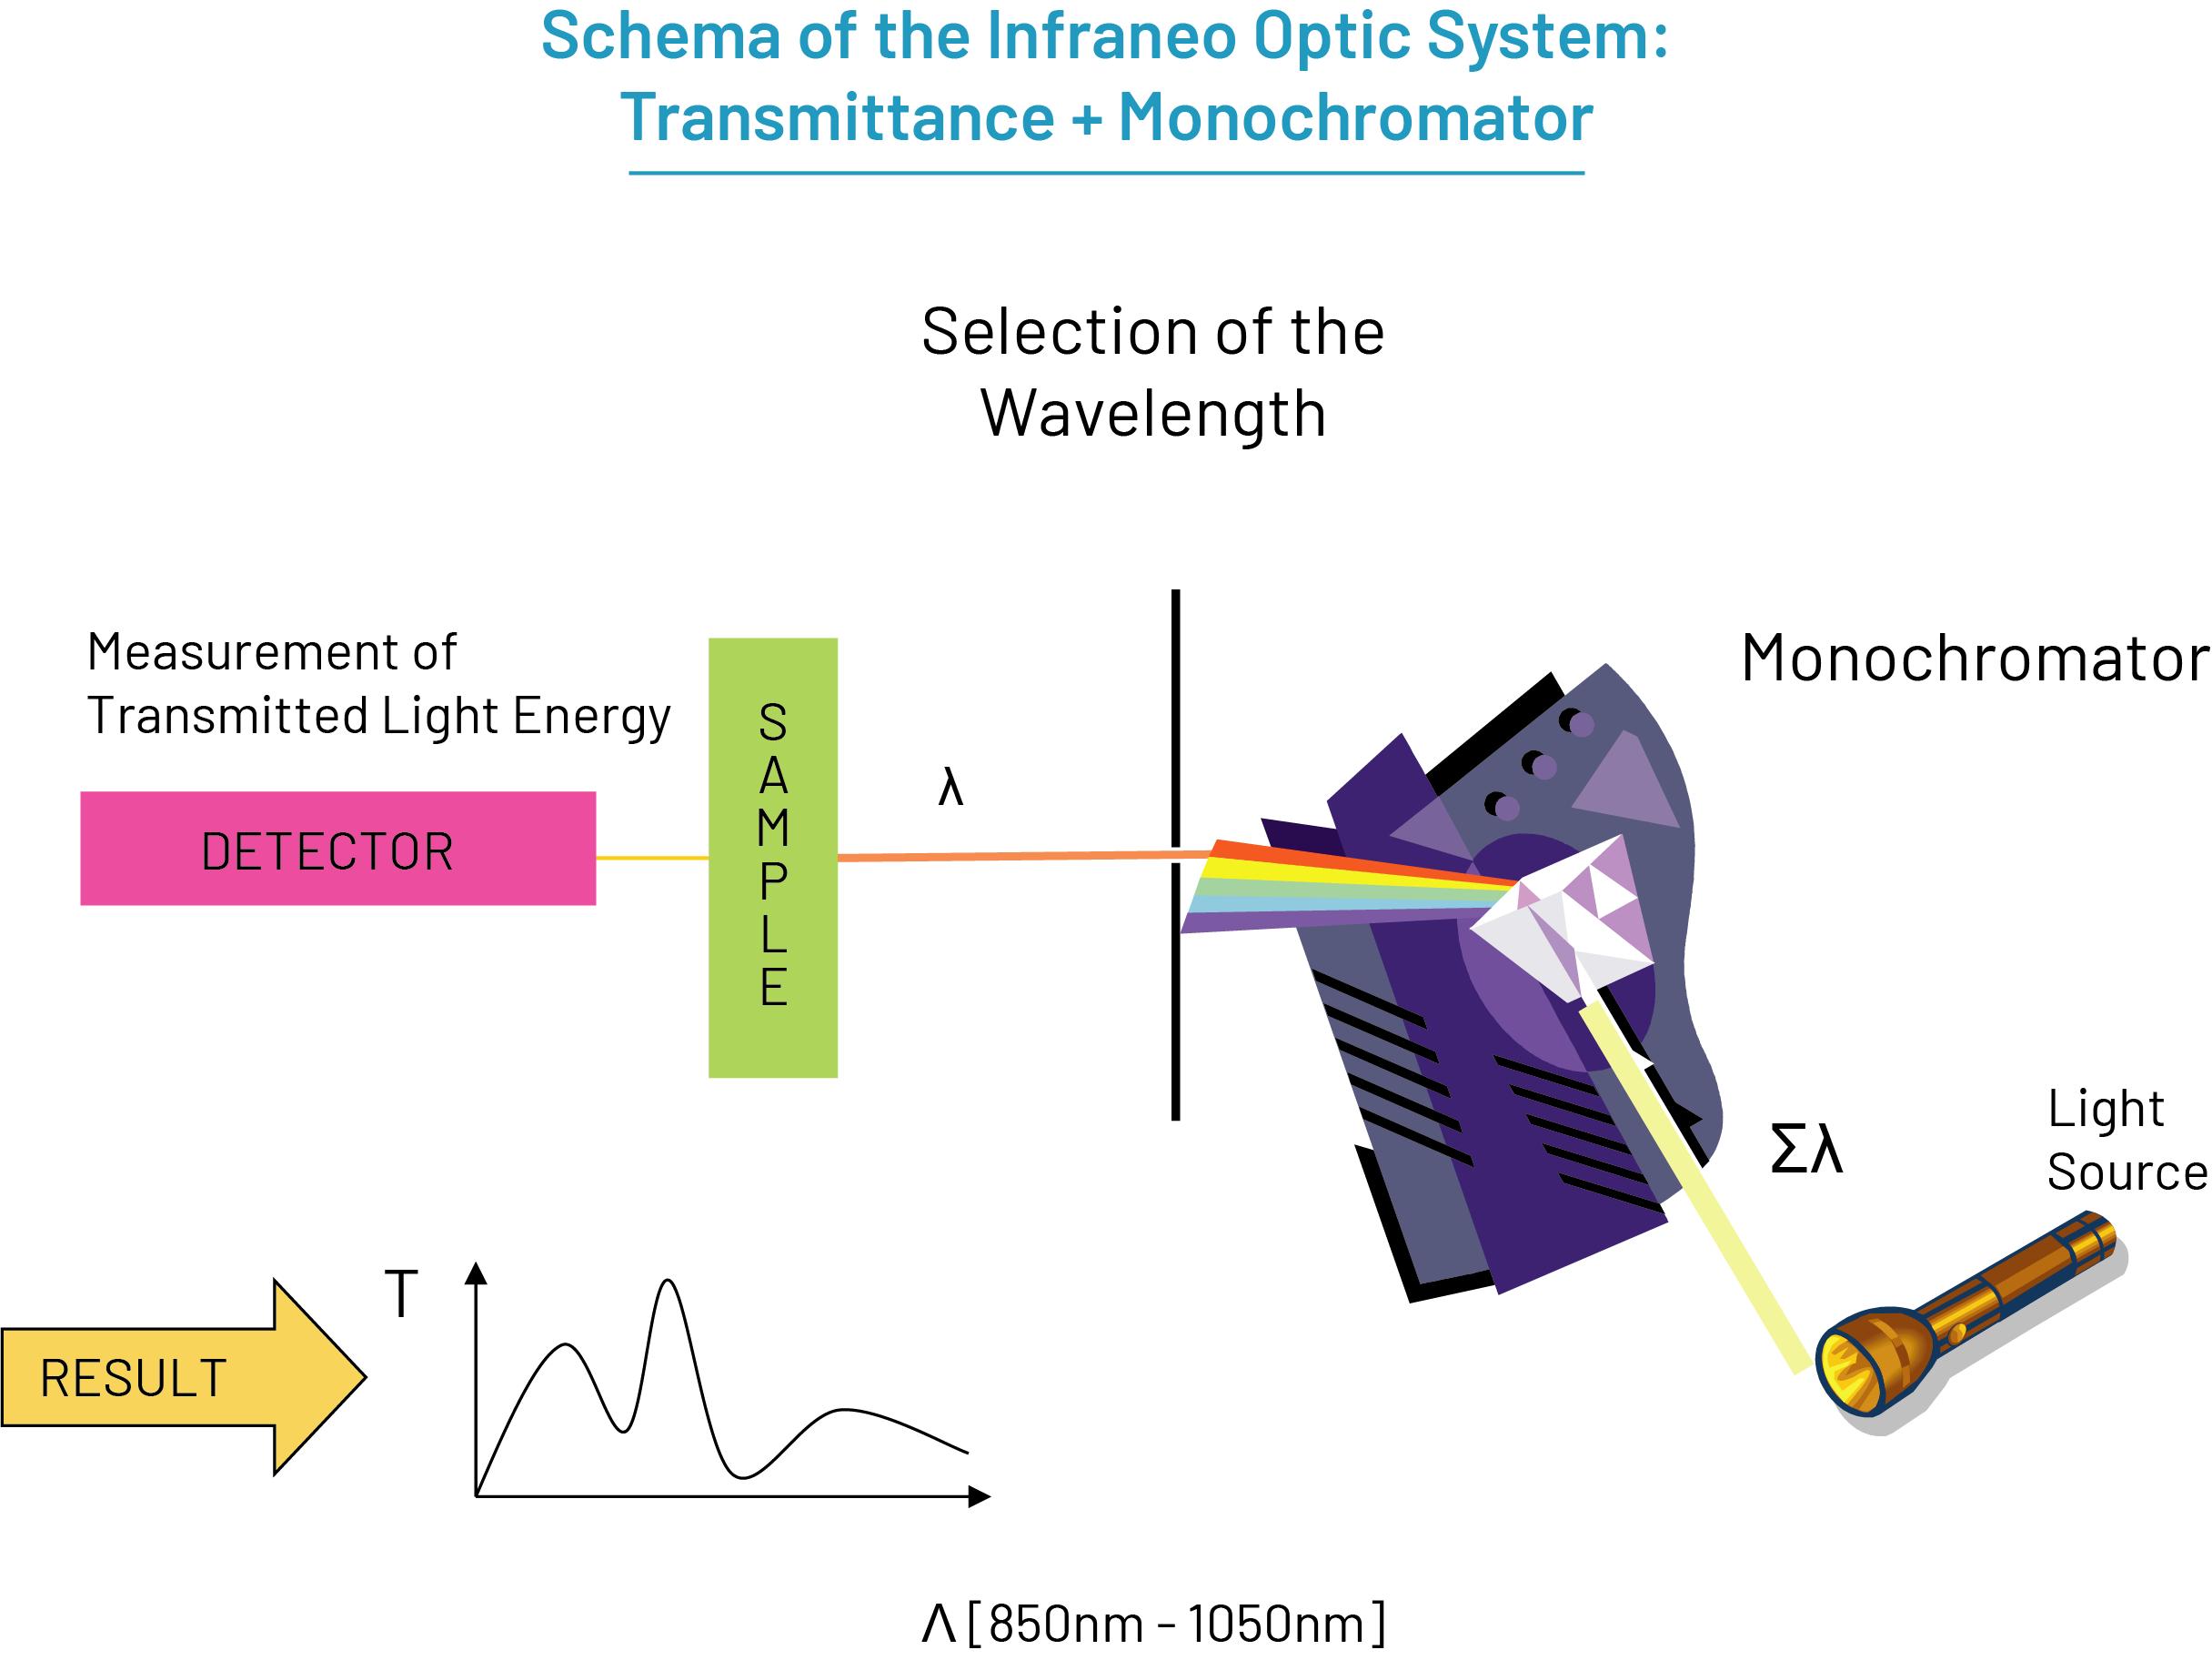 Infraneo Optic System: Transmittance + Monochromator